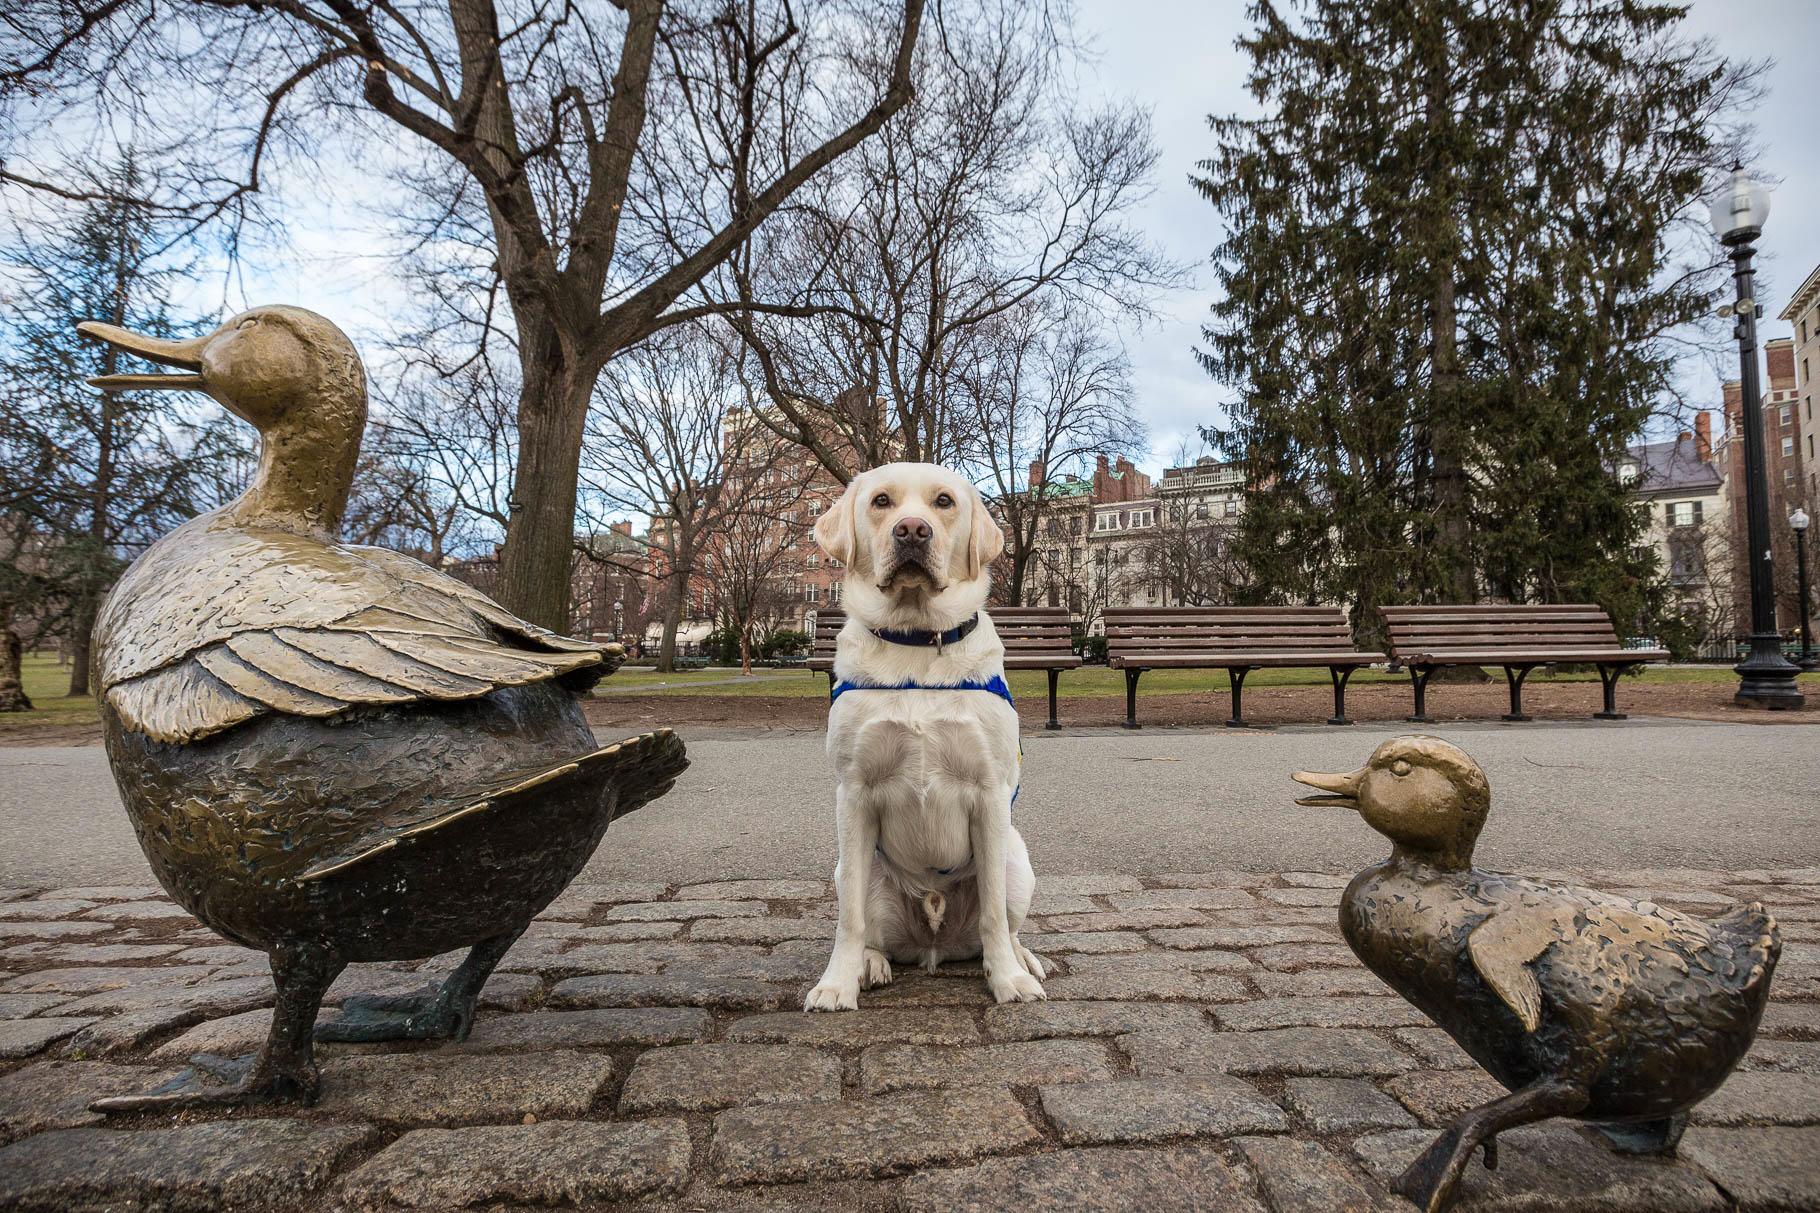 Boston Make Way for Ducklings